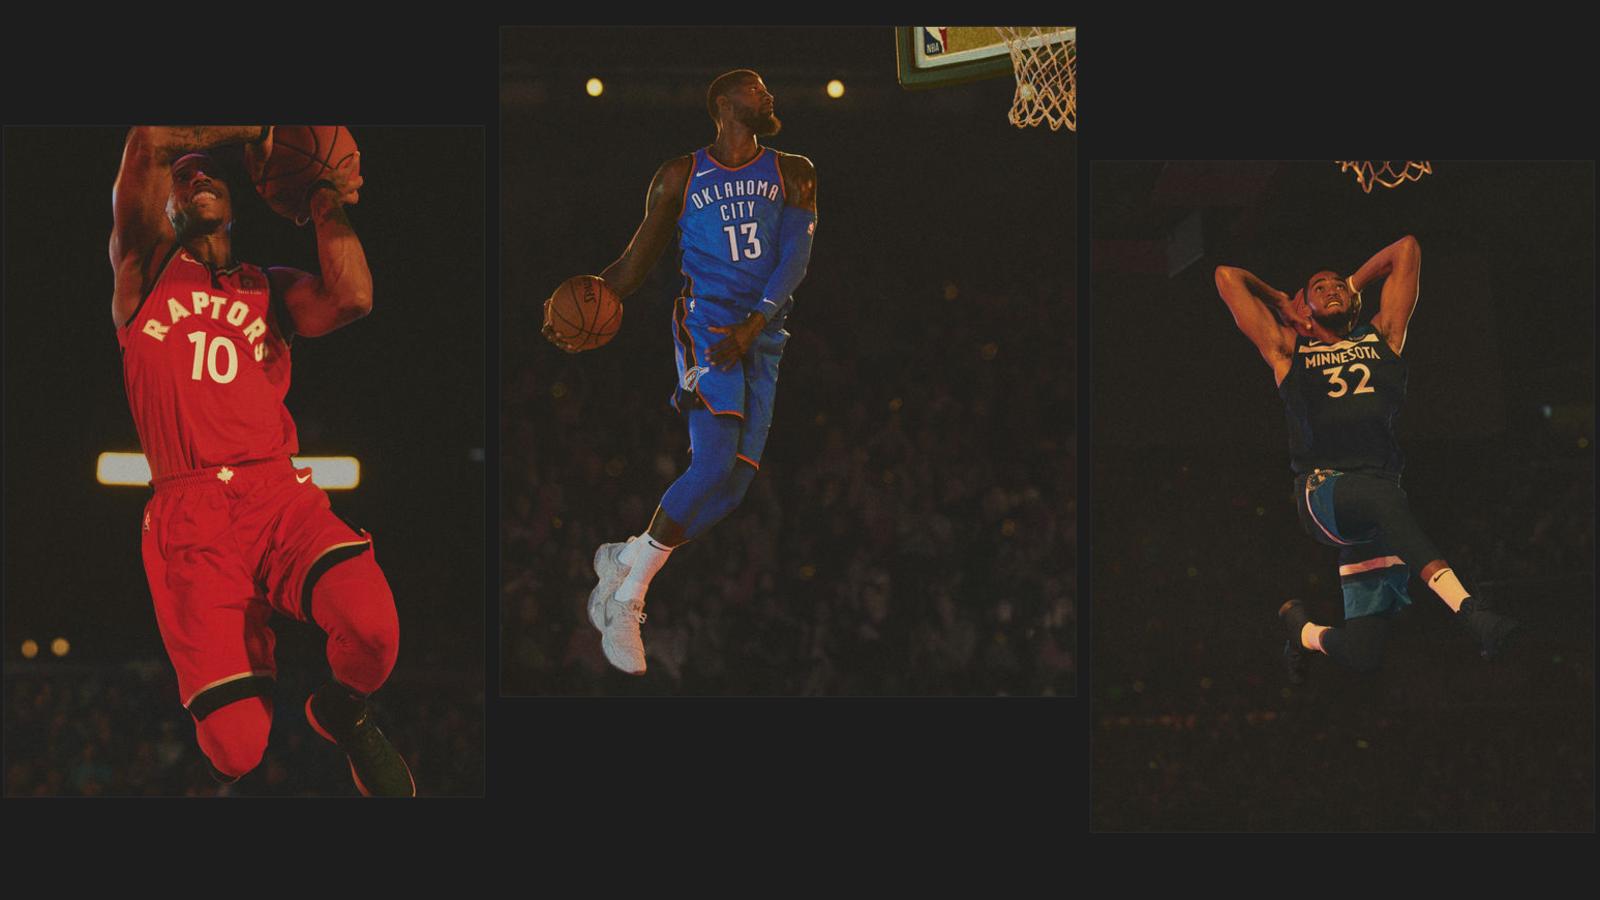 59f6ca5b2 Nike-NBA-Basketball-Jersey native 1600.png